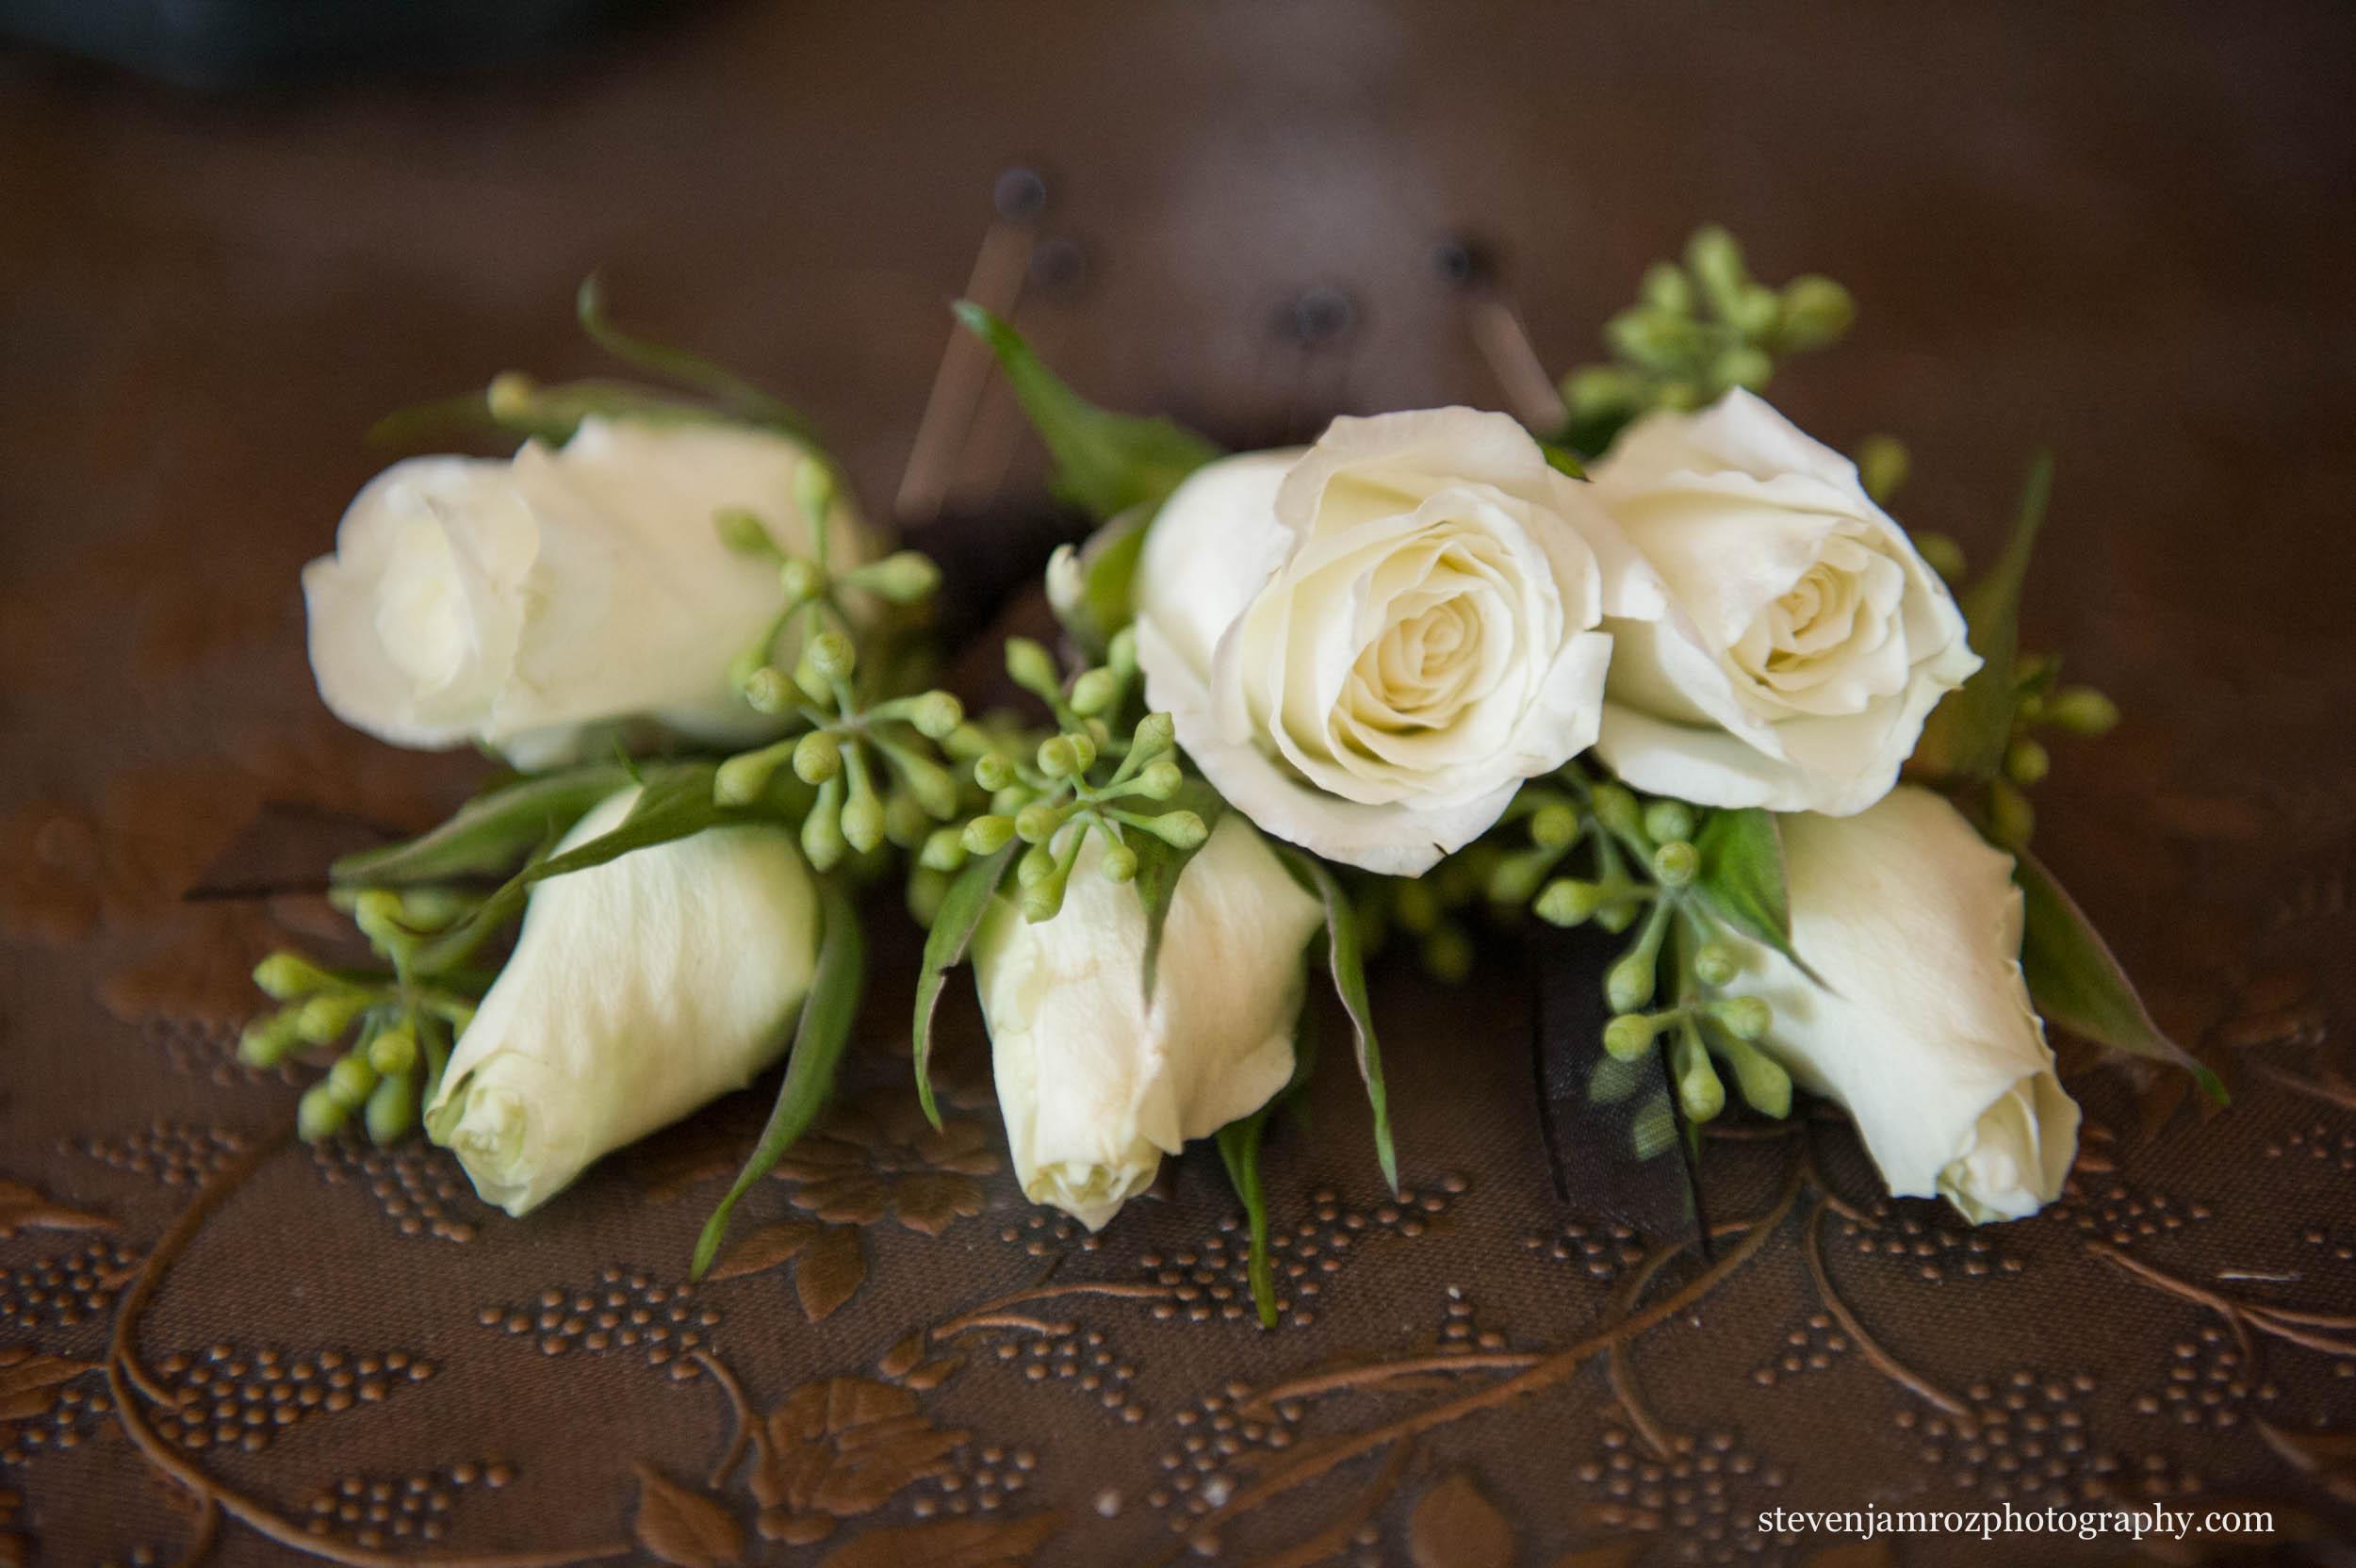 flowers-at-hudson-manor-estate-wedding-photography-0860.jpg